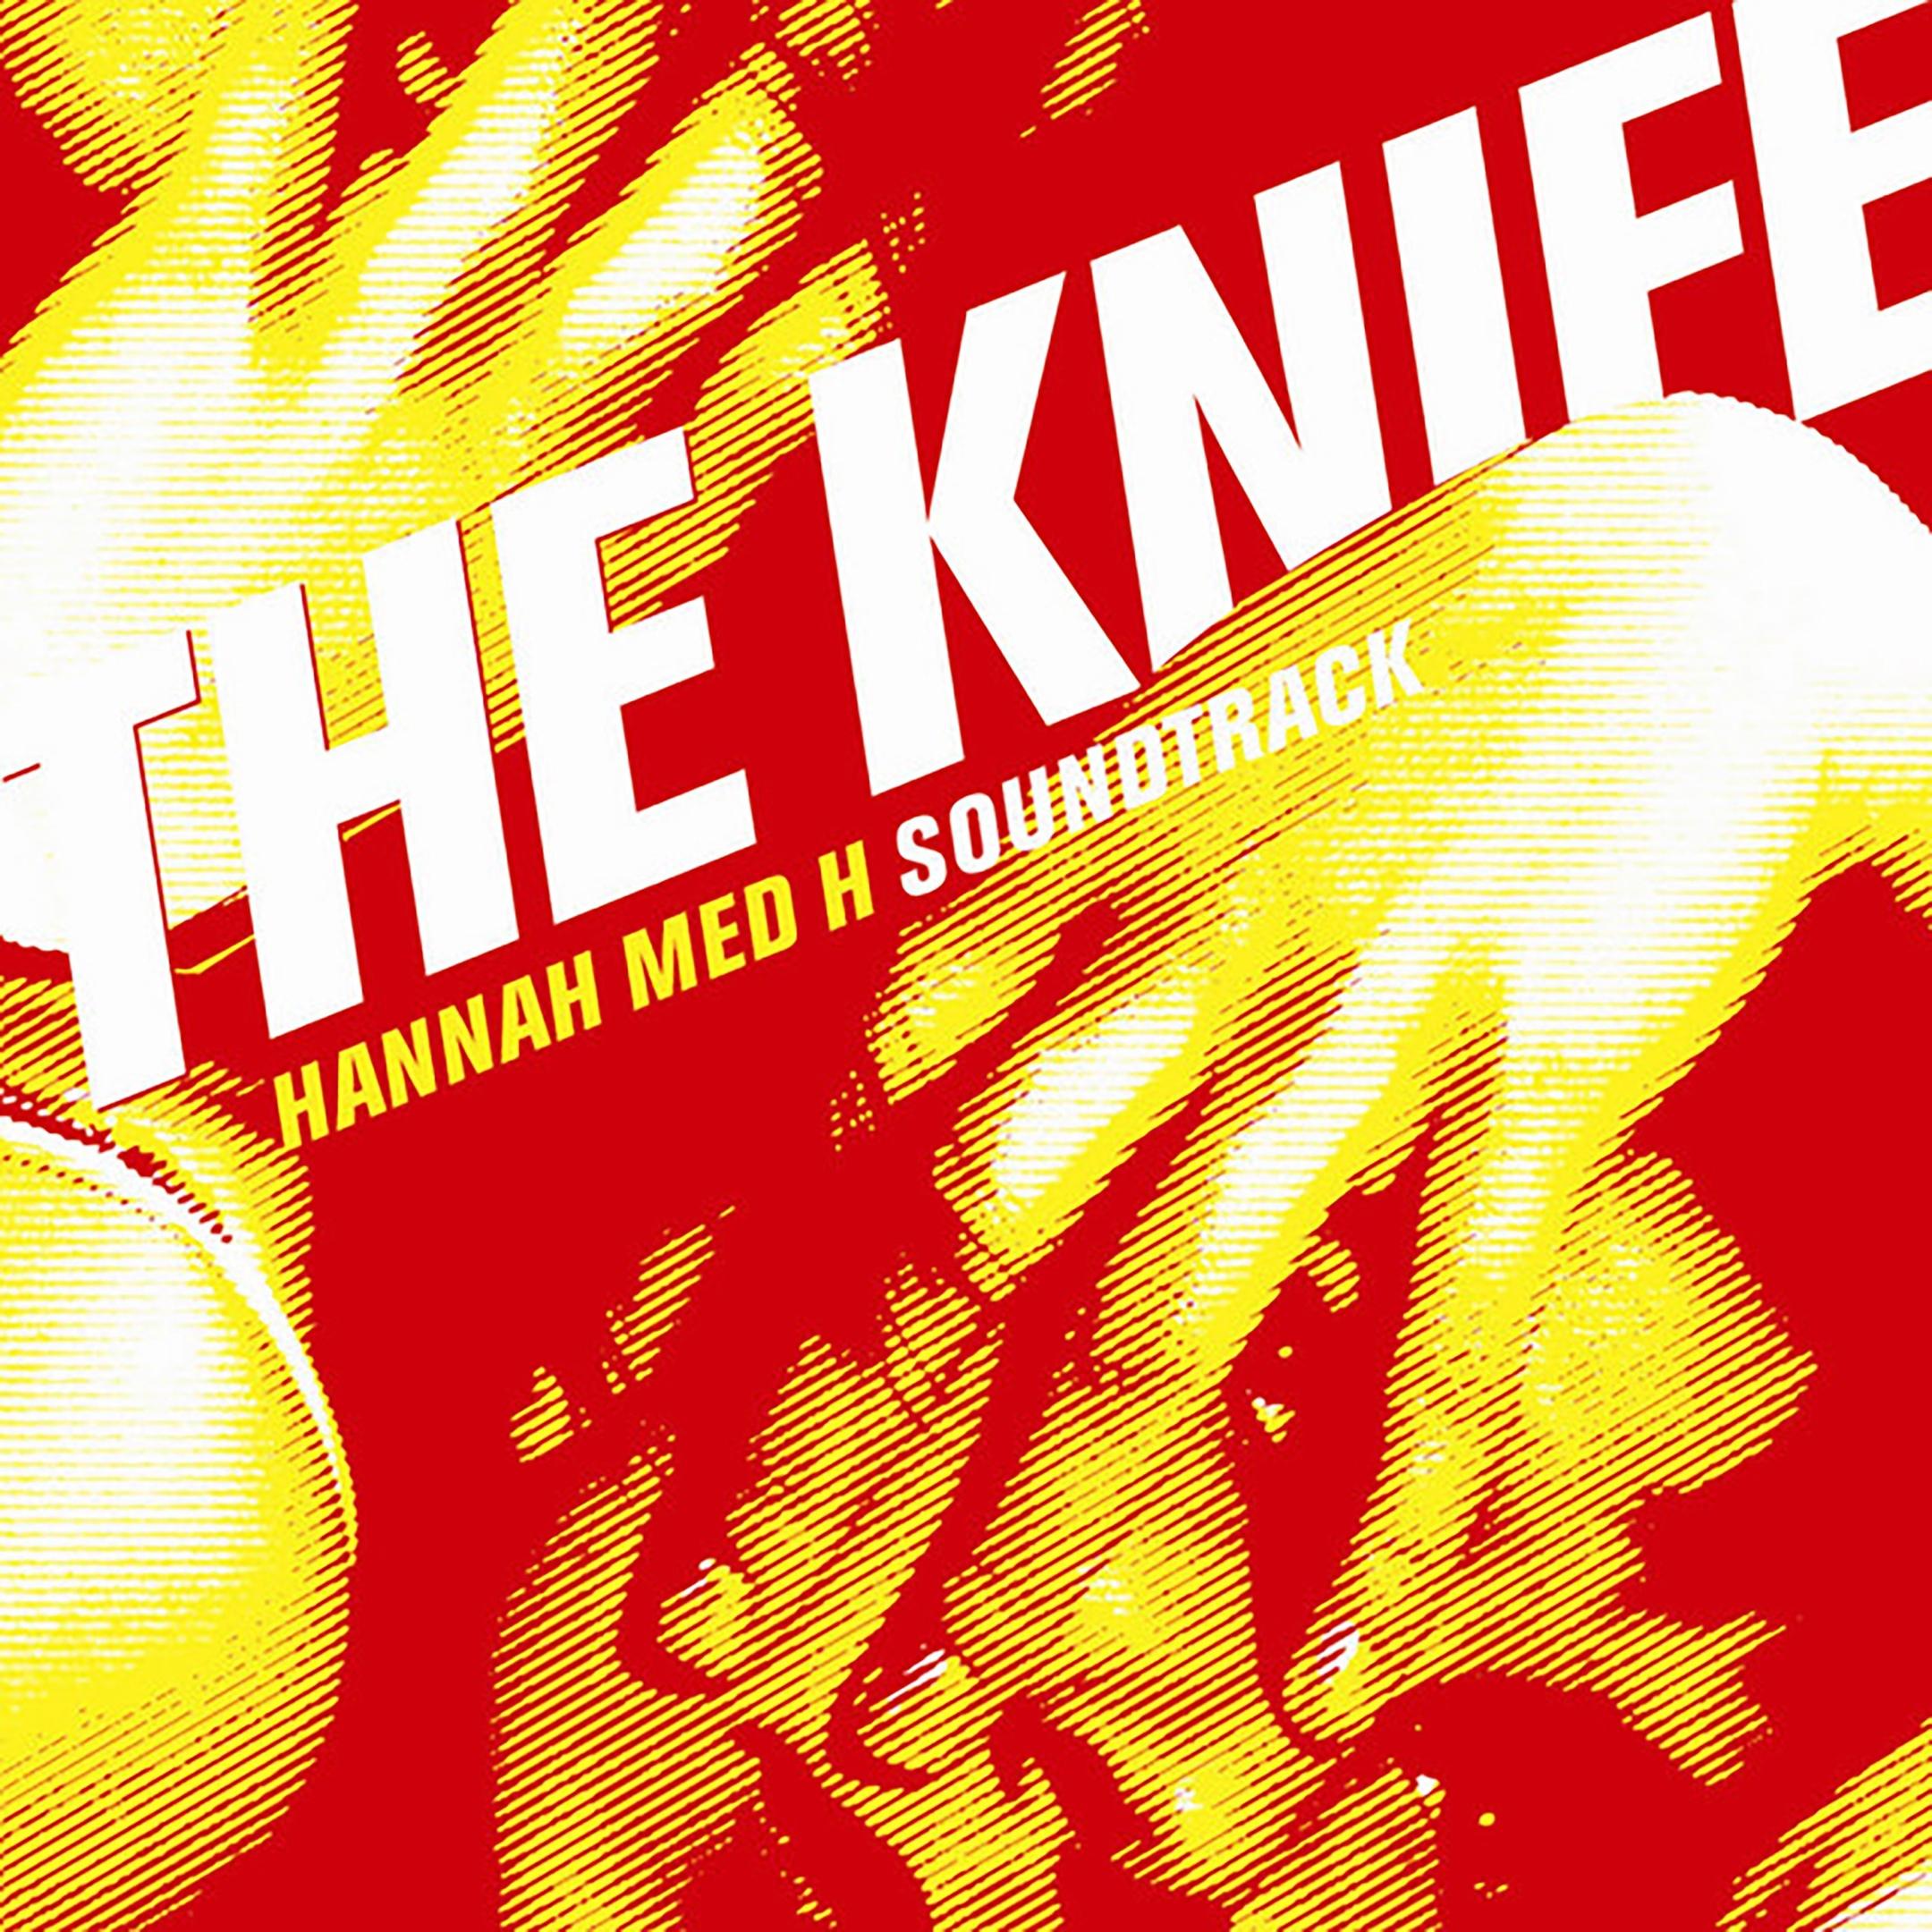 The Knife album Hannah Med H Soundtrack